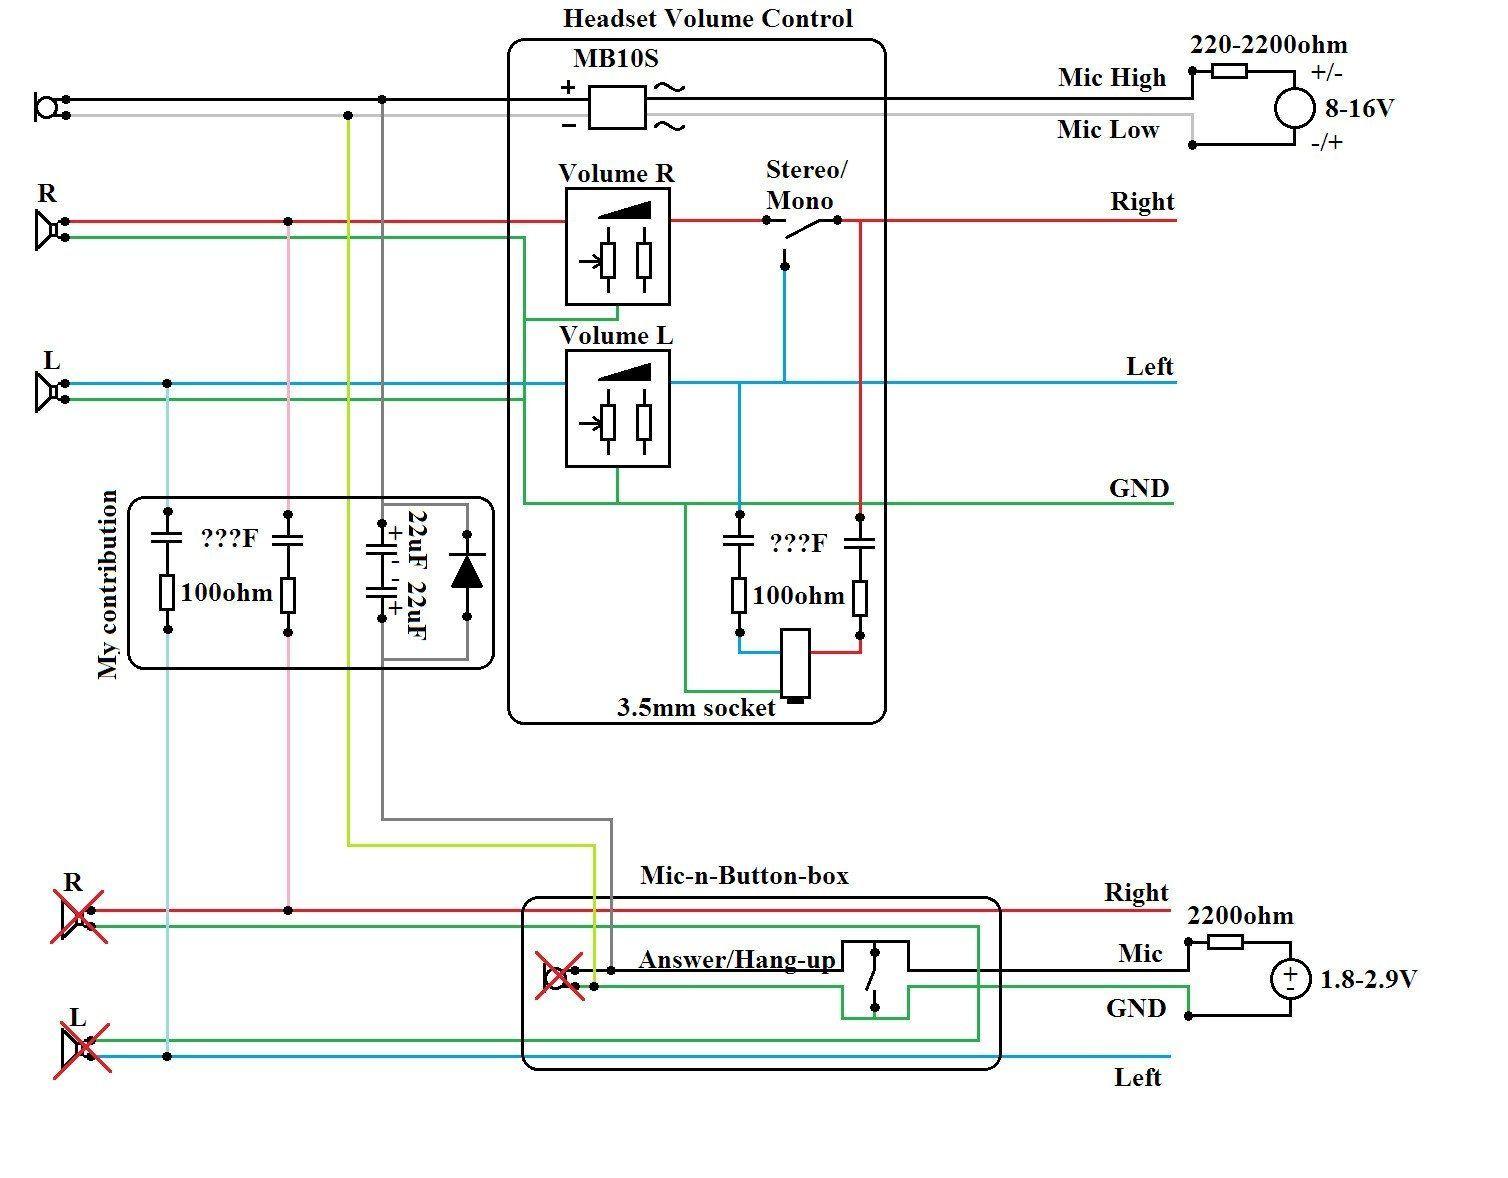 Wiring Diagram Uk Phone Socket in 2020 David clark